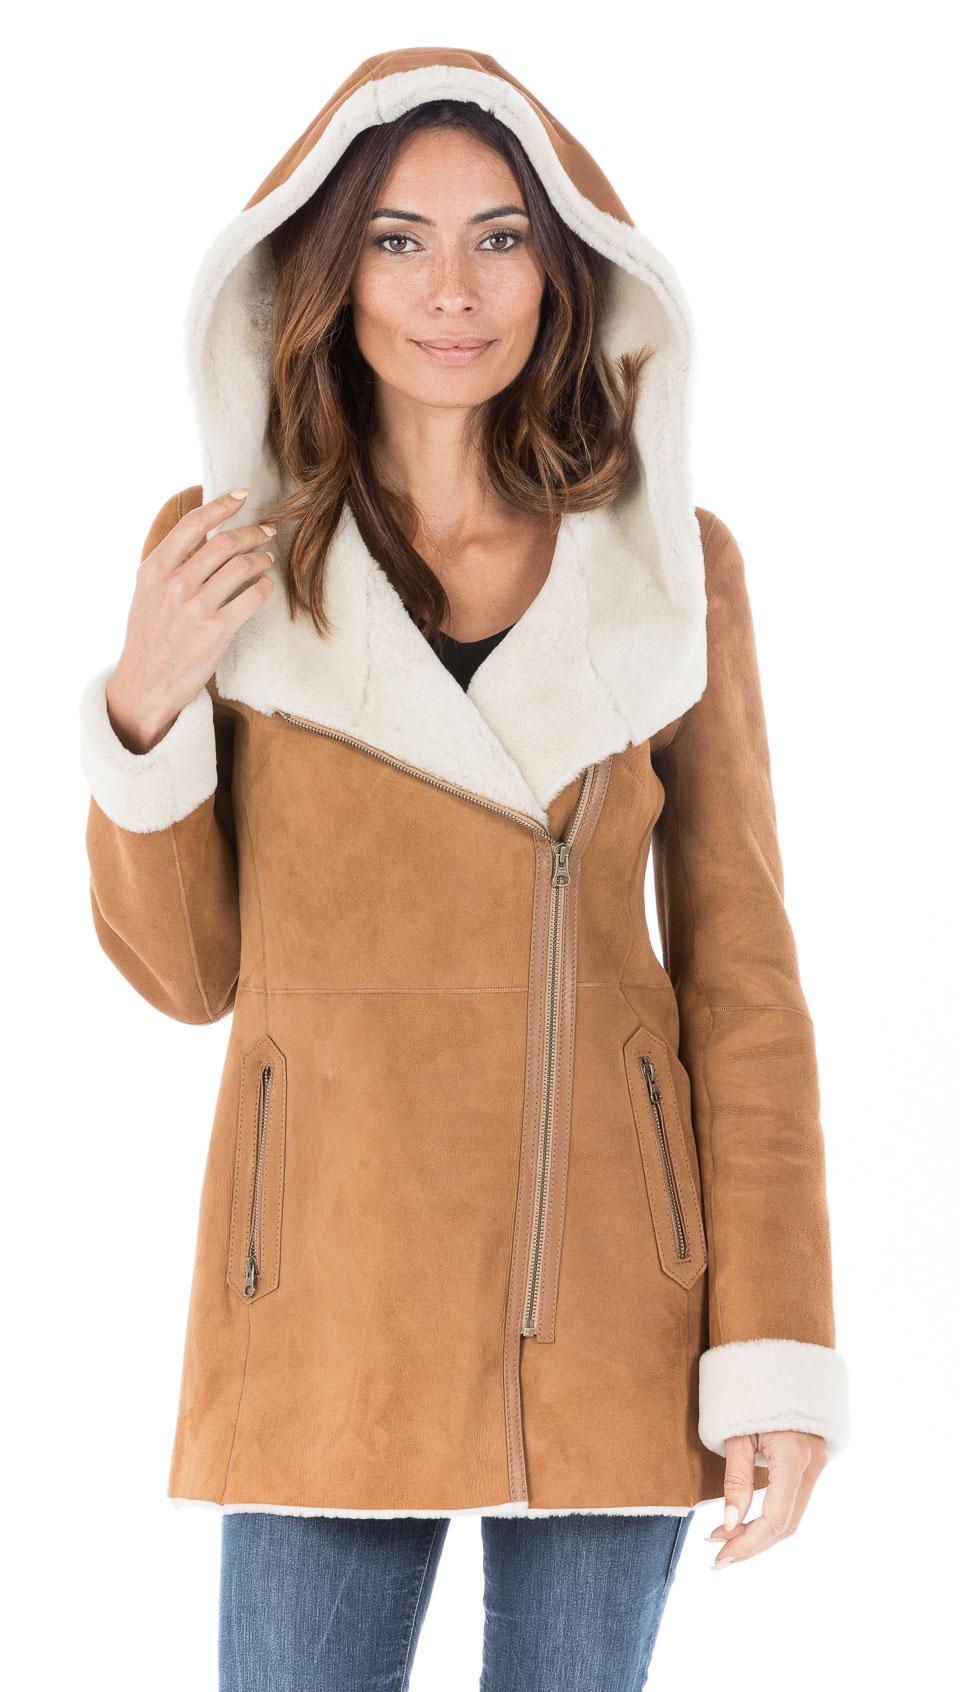 Manteau peau mouton retourne femme